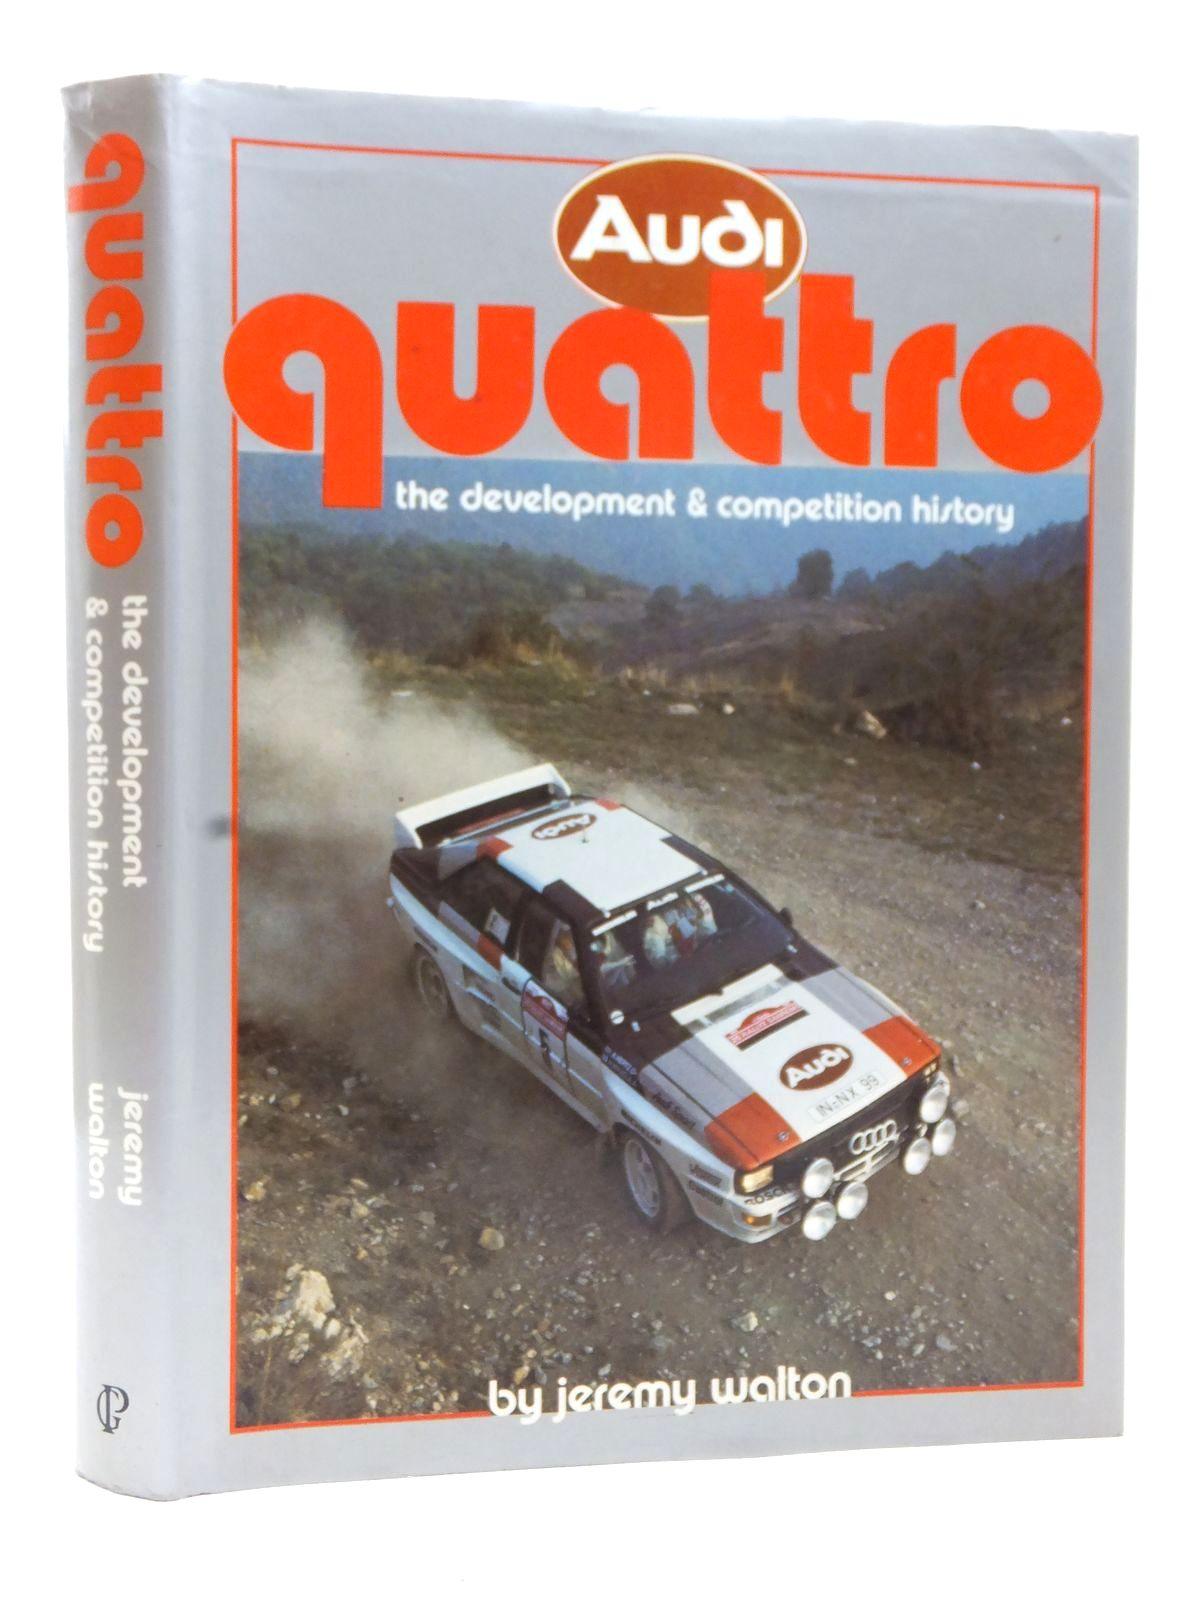 Audi Quattro The Development & Competition History